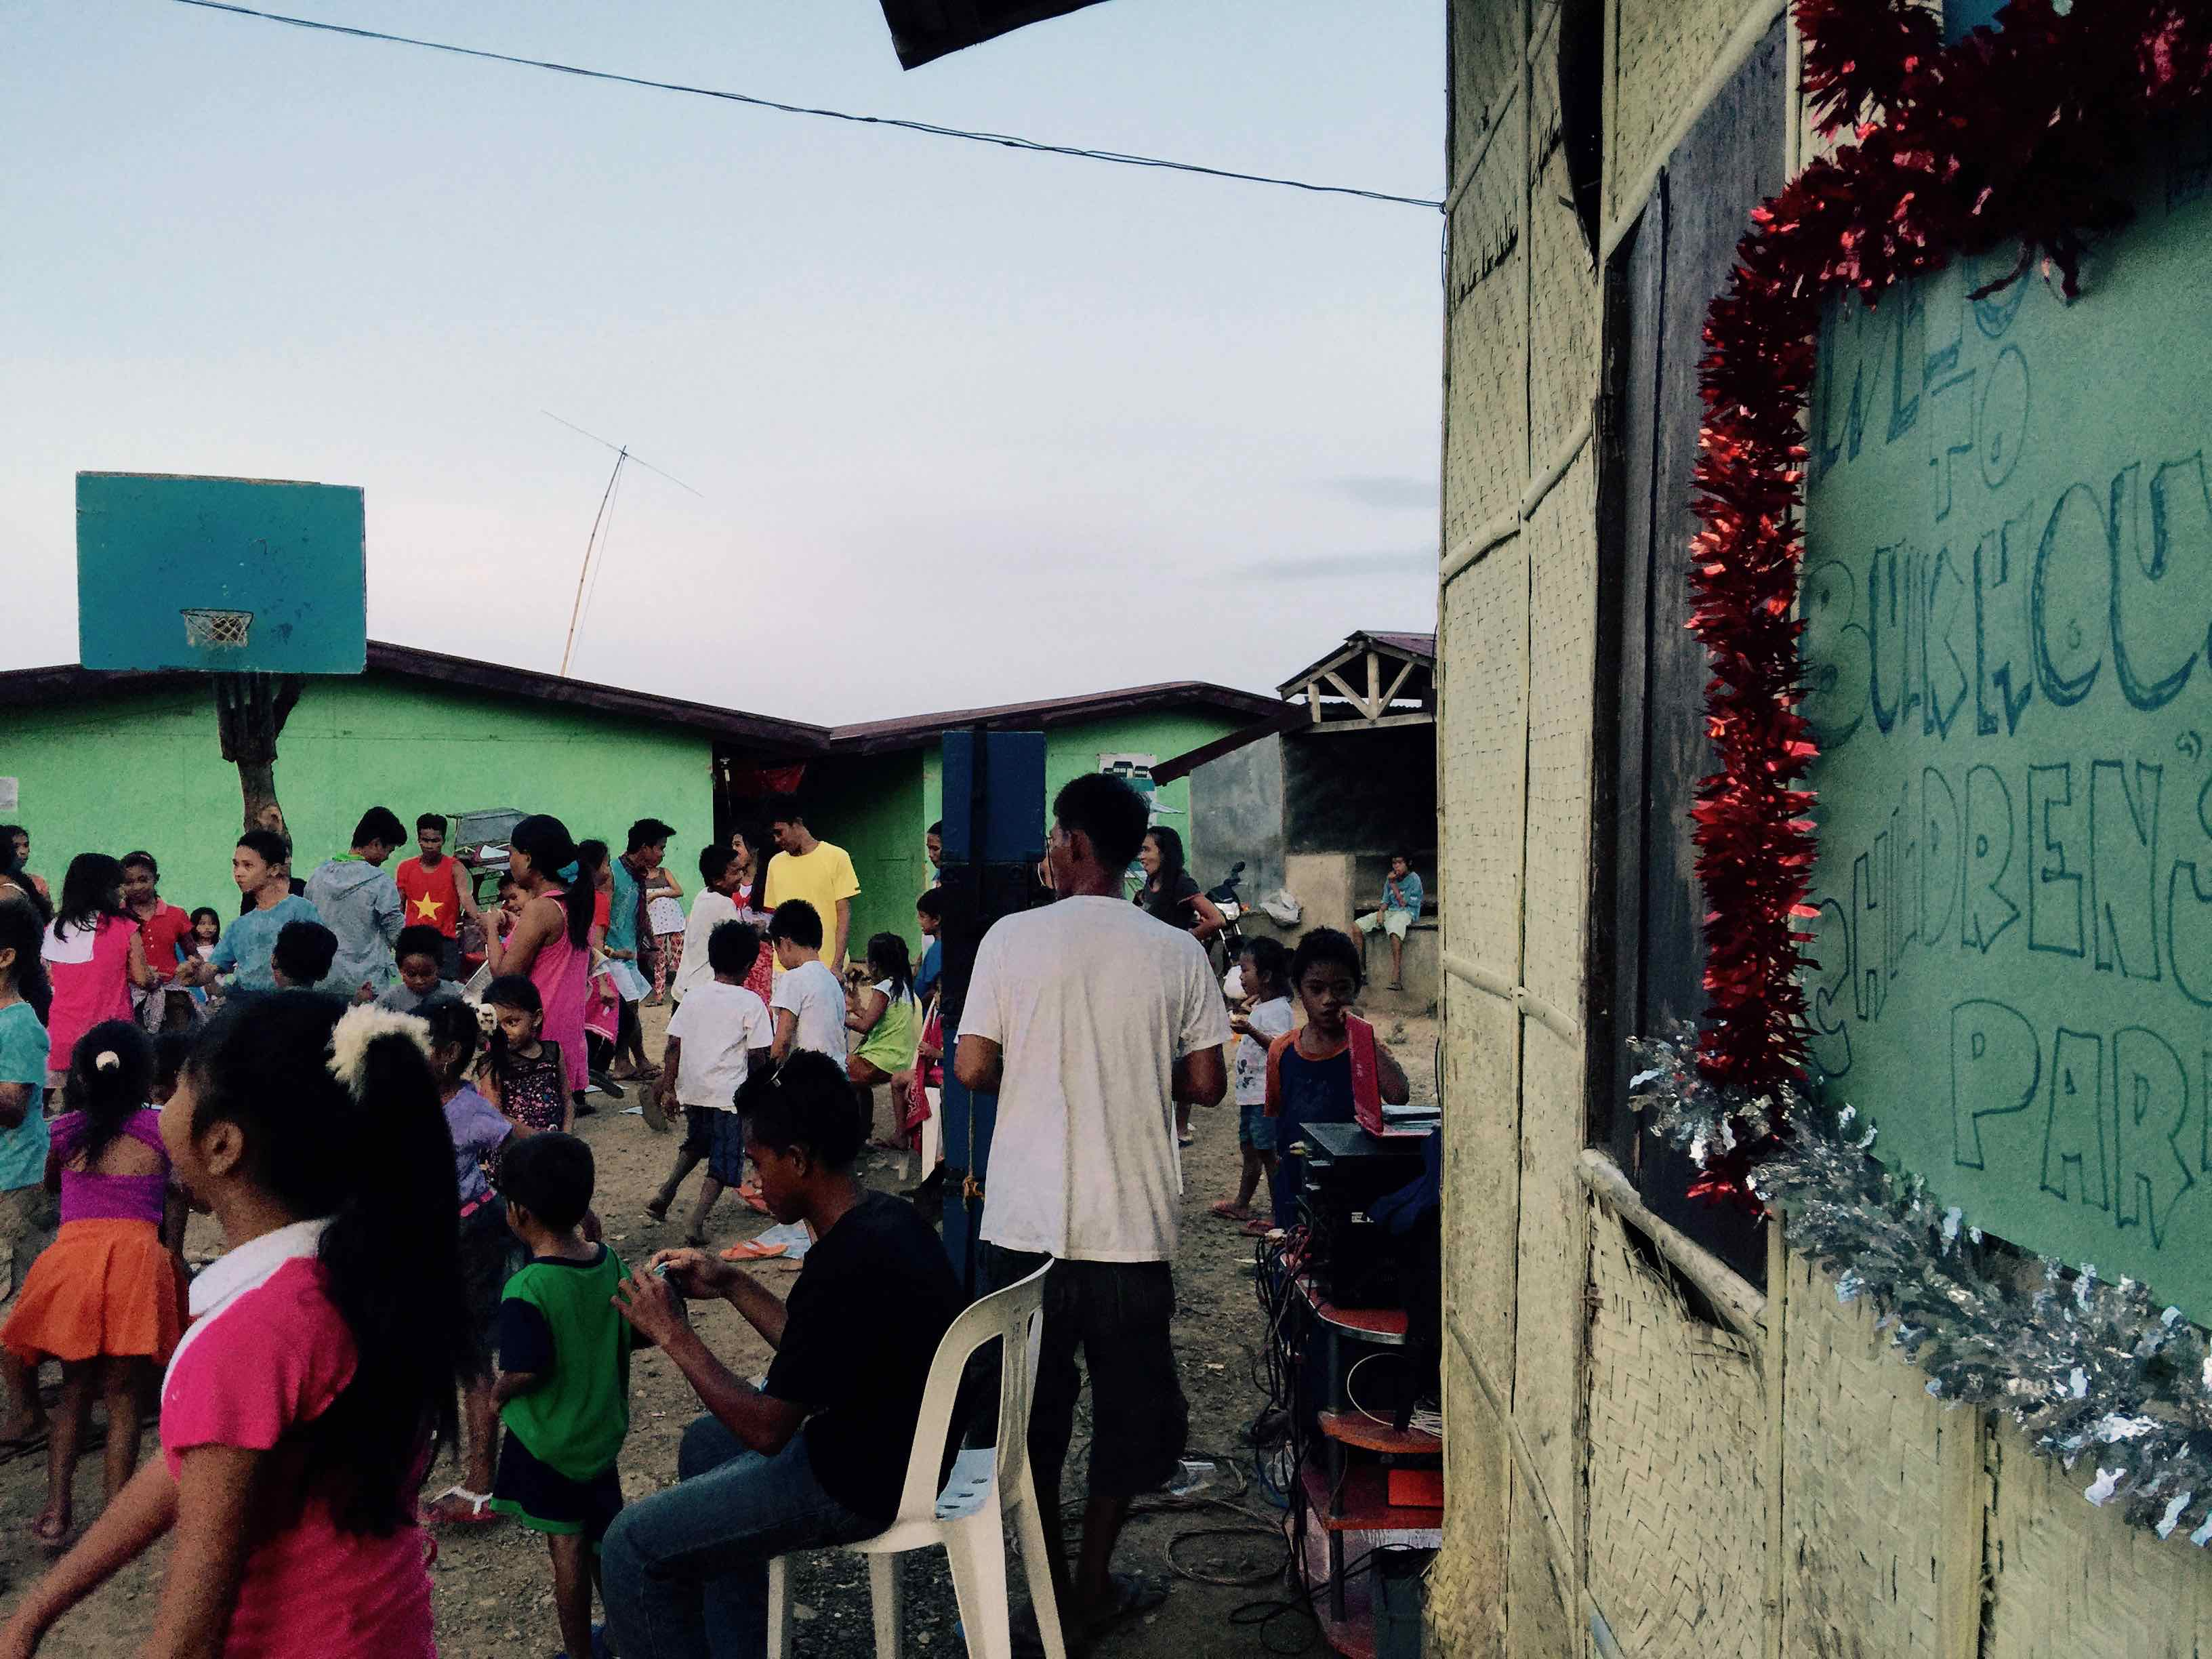 bunkhouse christmas party estancia 26